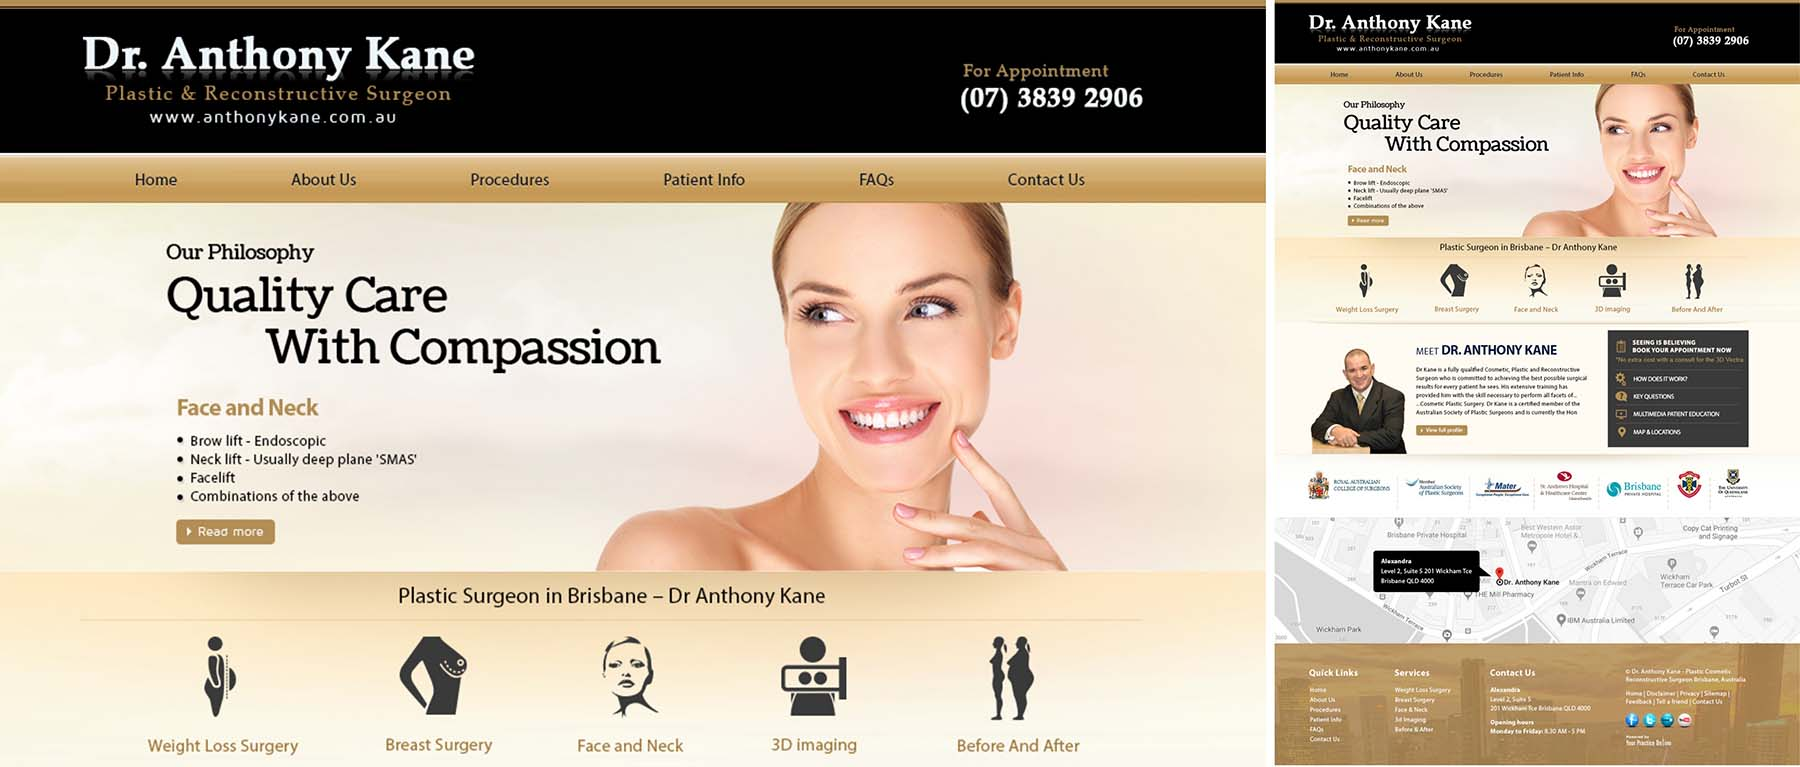 brisbane-plastic-surgeon-2.jpg